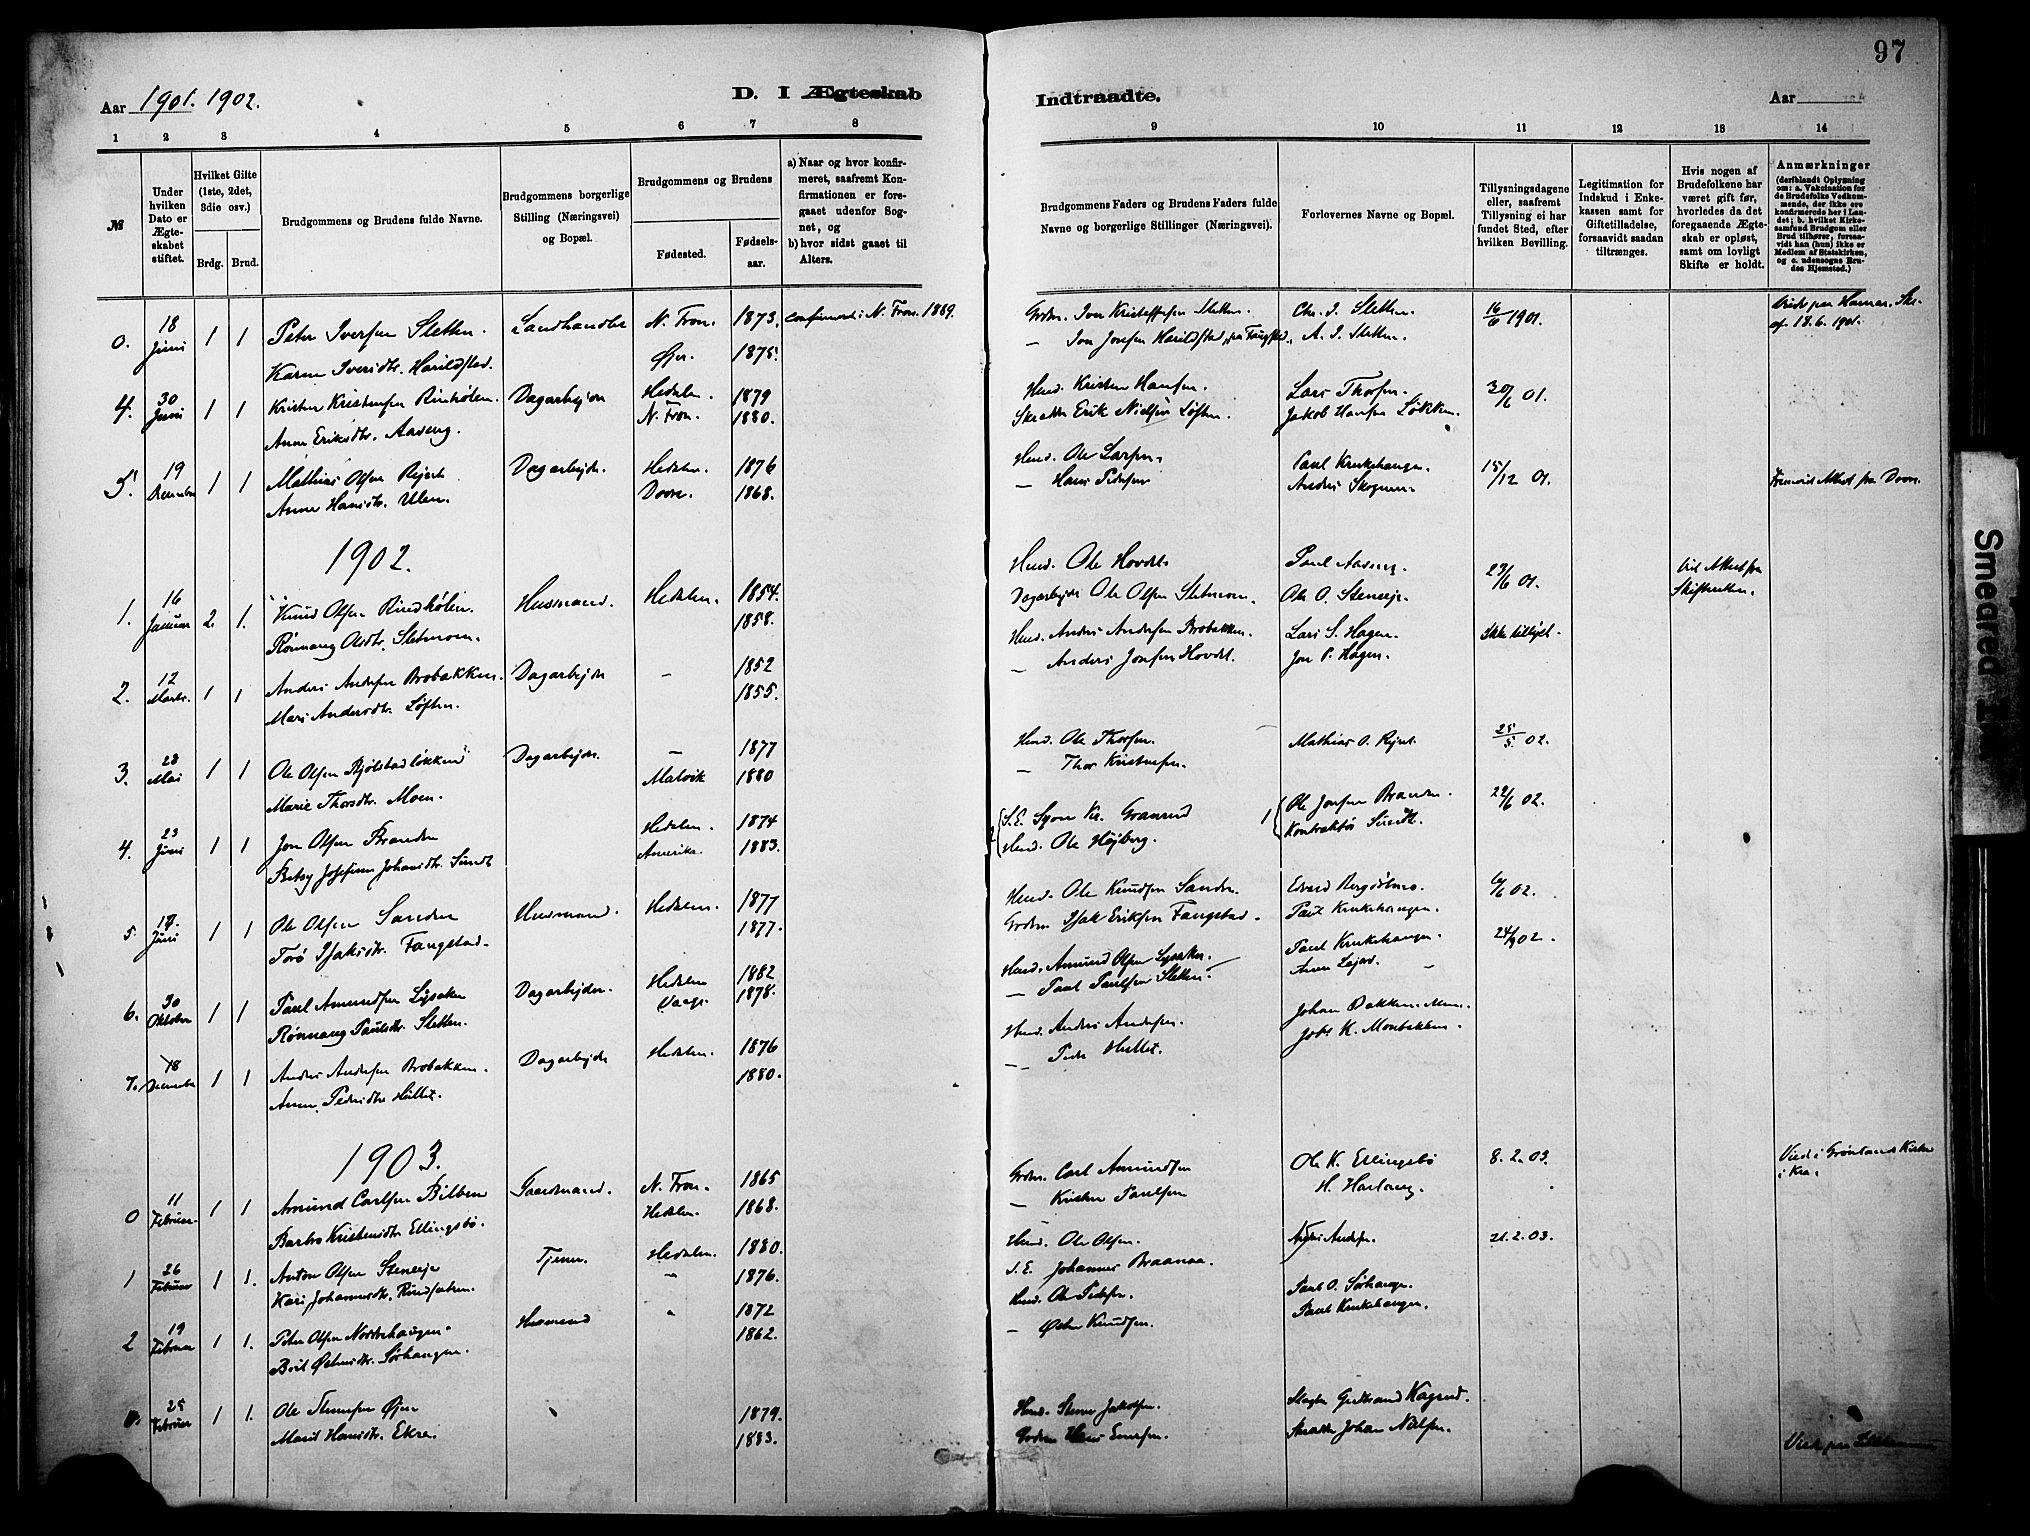 SAH, Vågå prestekontor, Ministerialbok nr. 10, 1887-1904, s. 97